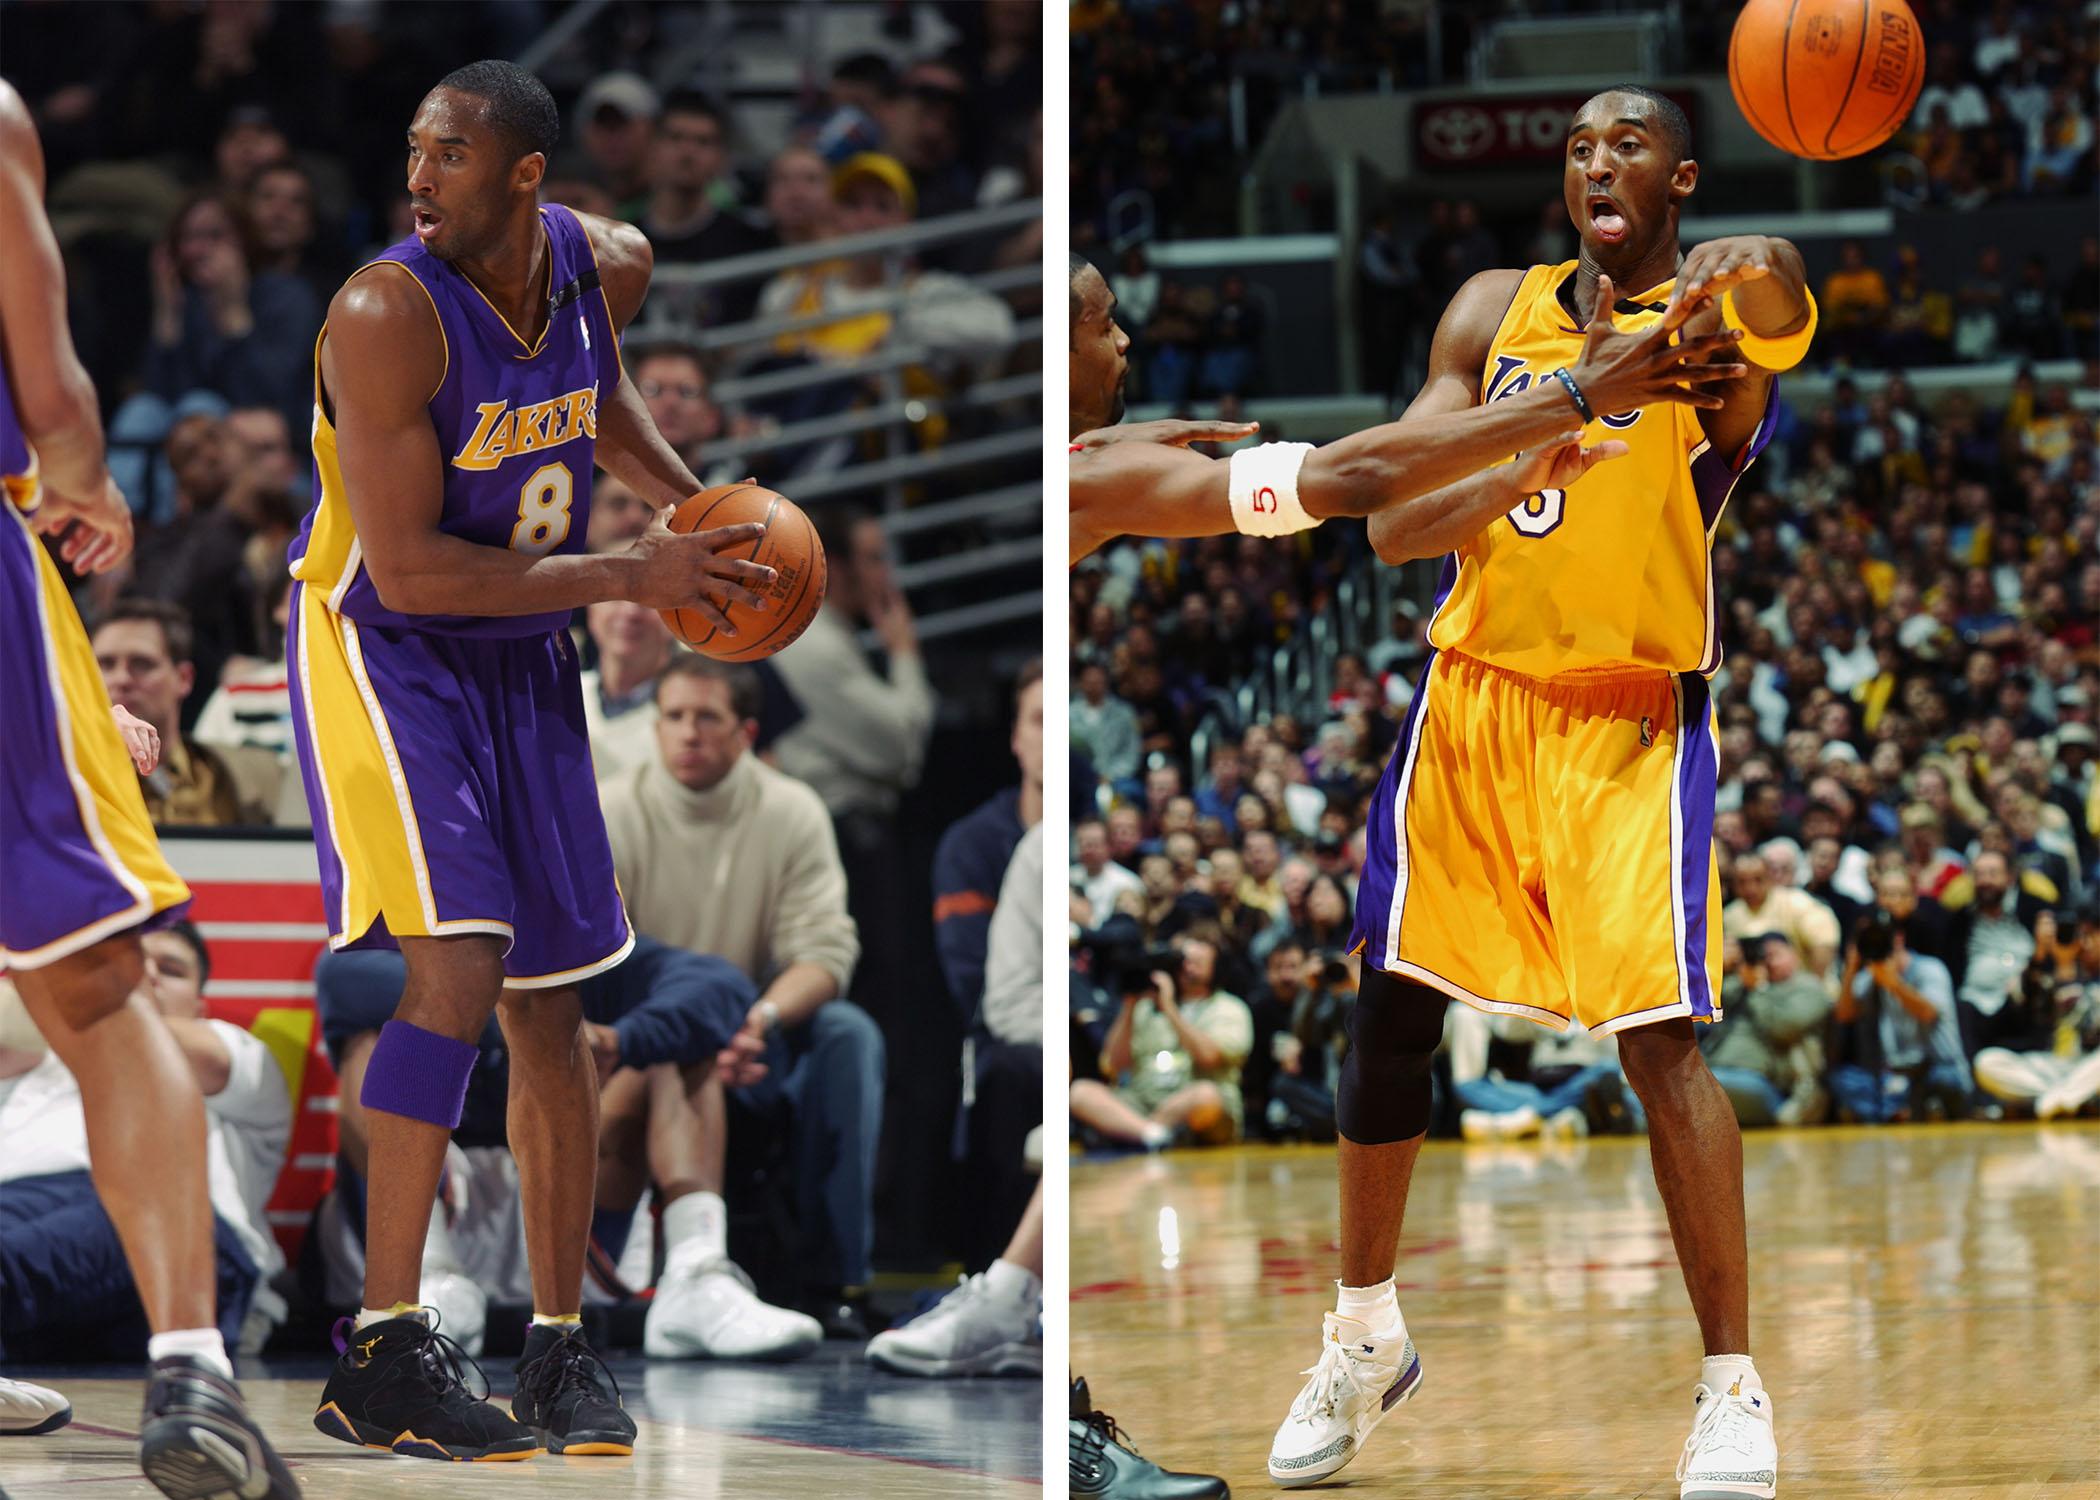 Treinta comunicación firma  Kobe Bryant's story through 8 signature sneaker moments